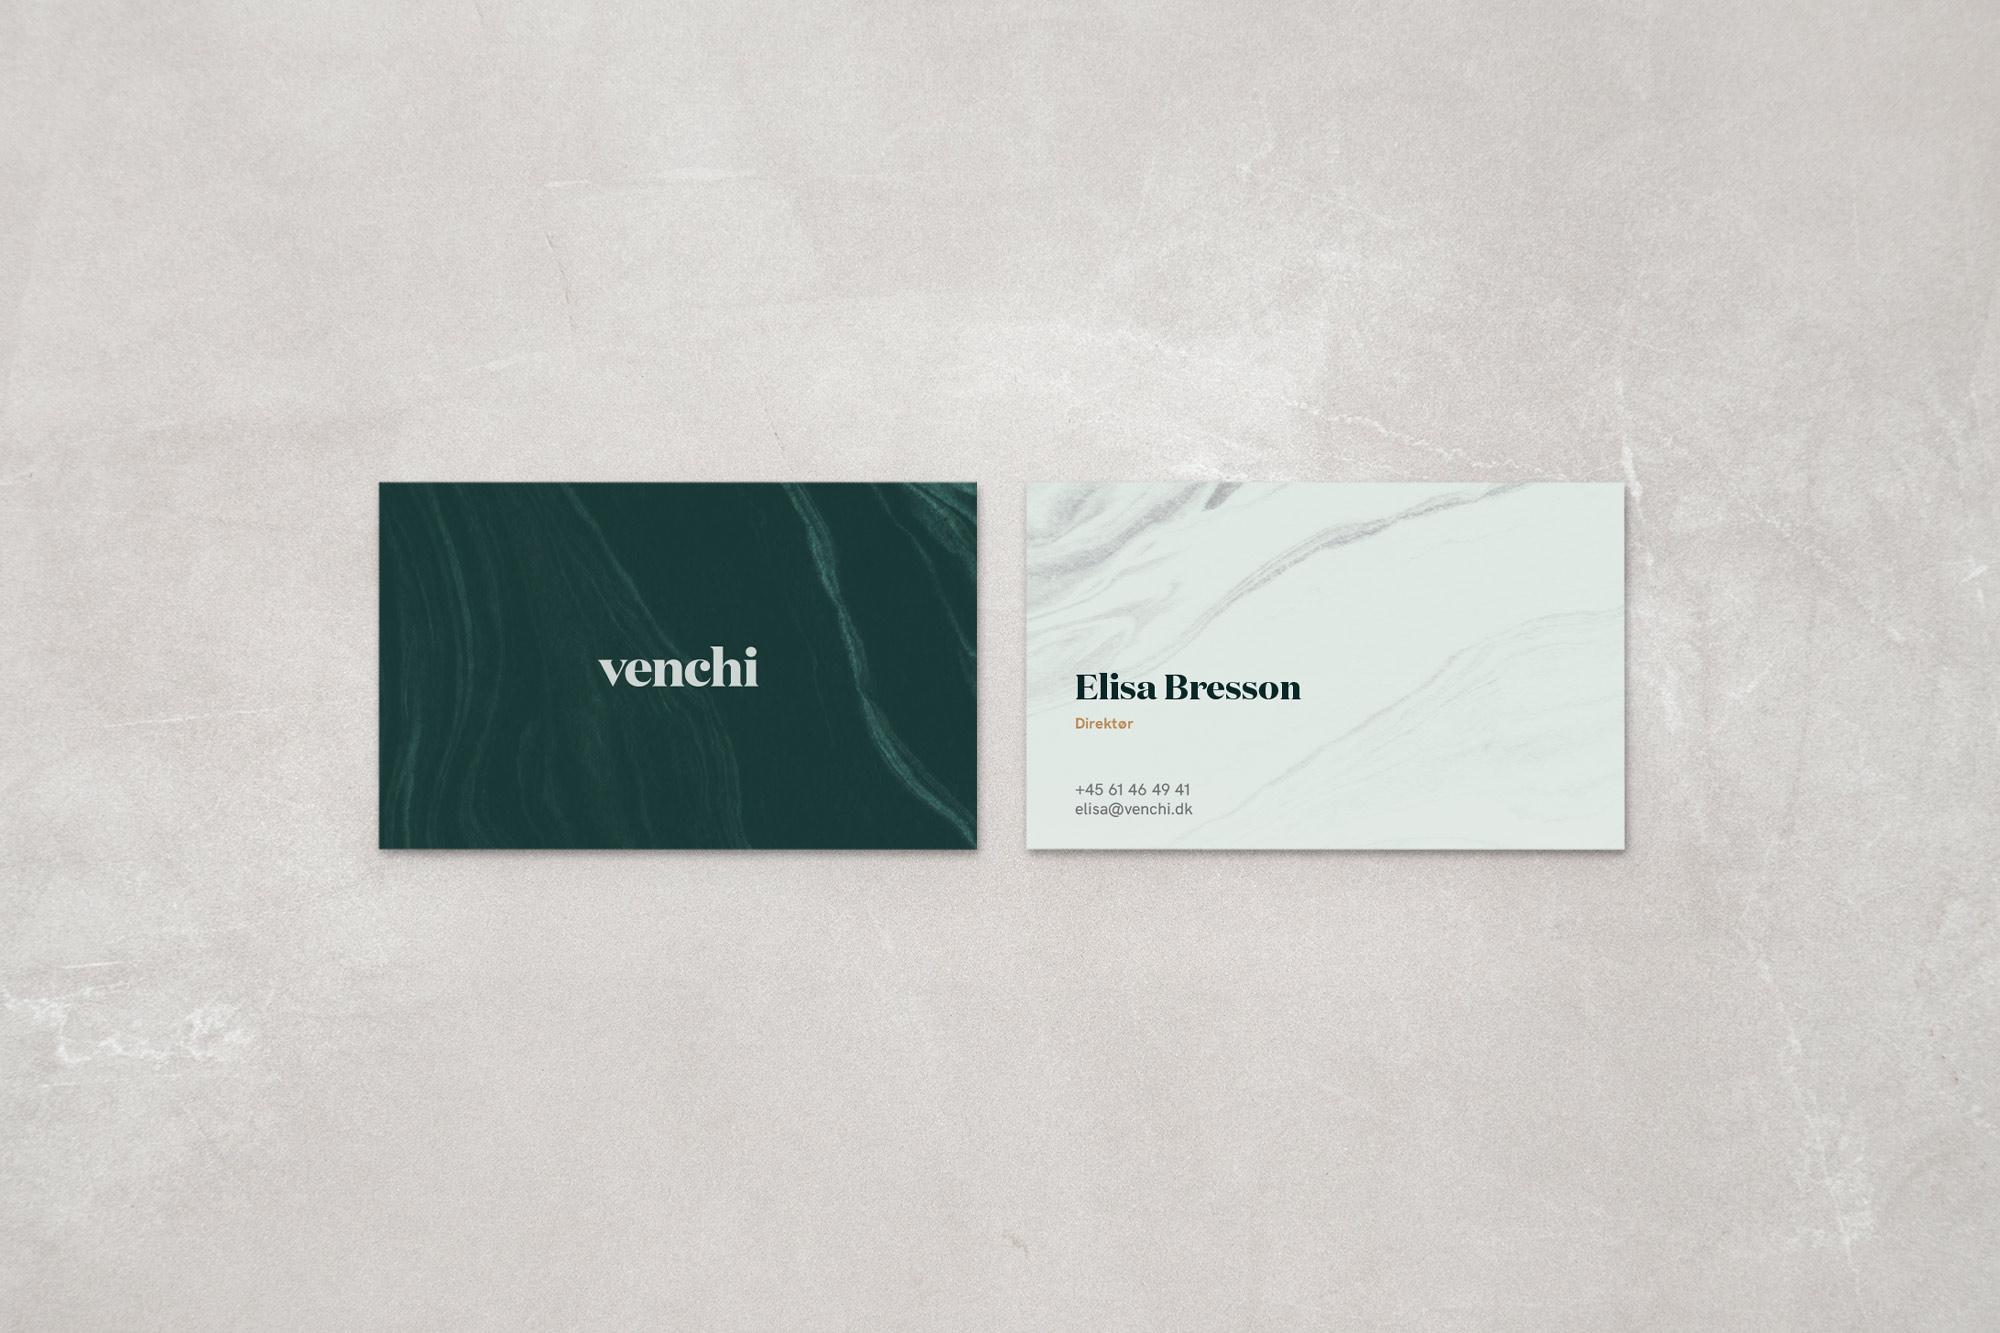 Venchi_Visitkort